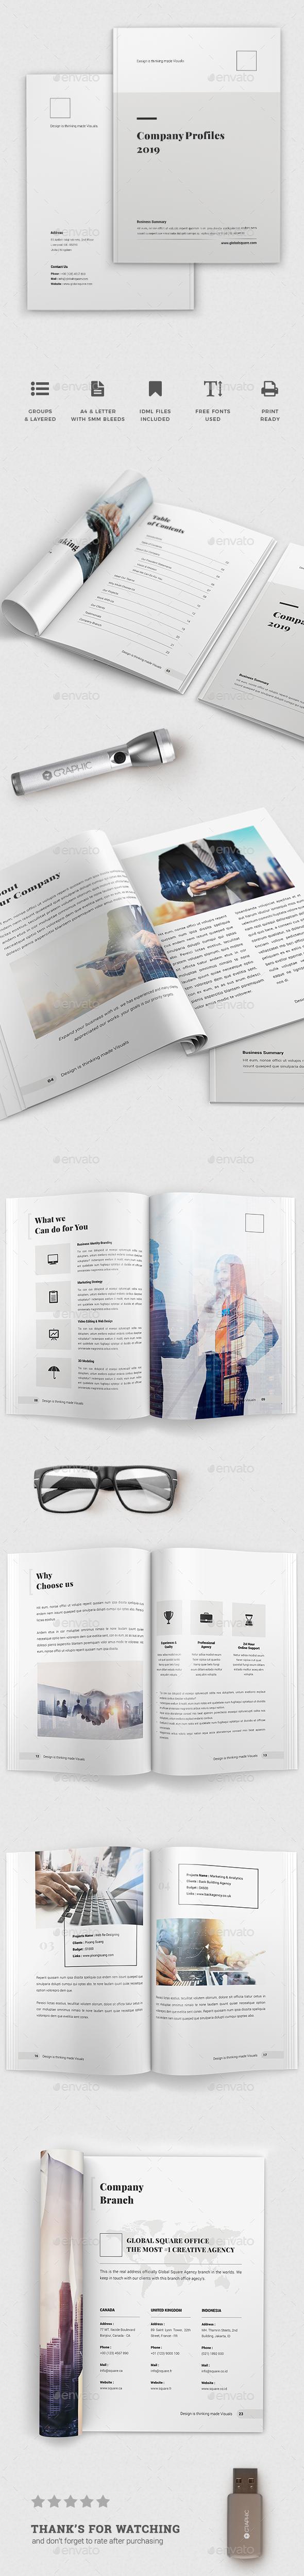 Mutlipurpose Corporate Brochure Template Vol. 28 - Brochures Print Templates